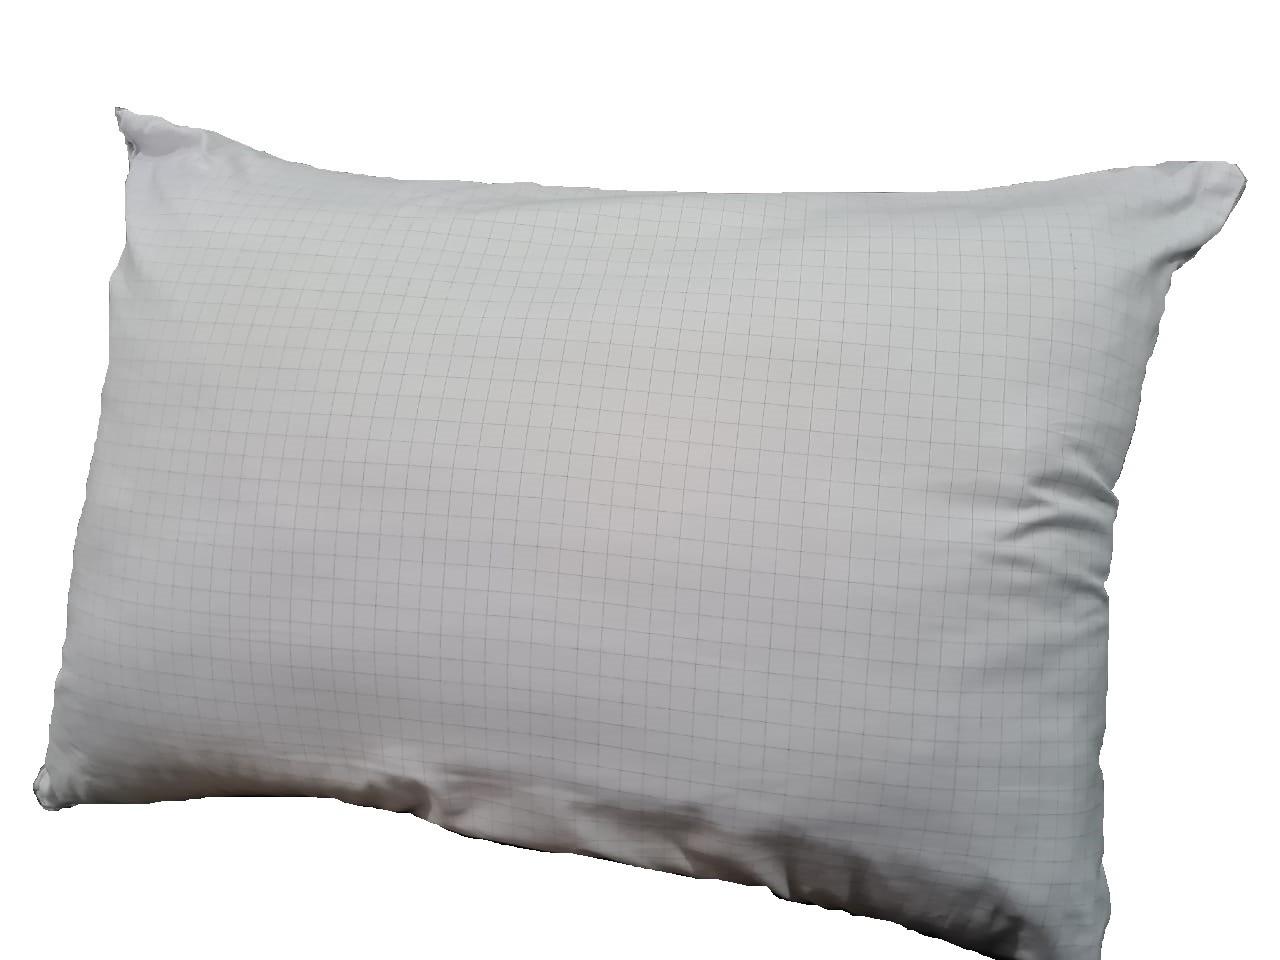 Kit Com 2 Travesseiro Anti-Stress 50x70 Toque Macio Admirare